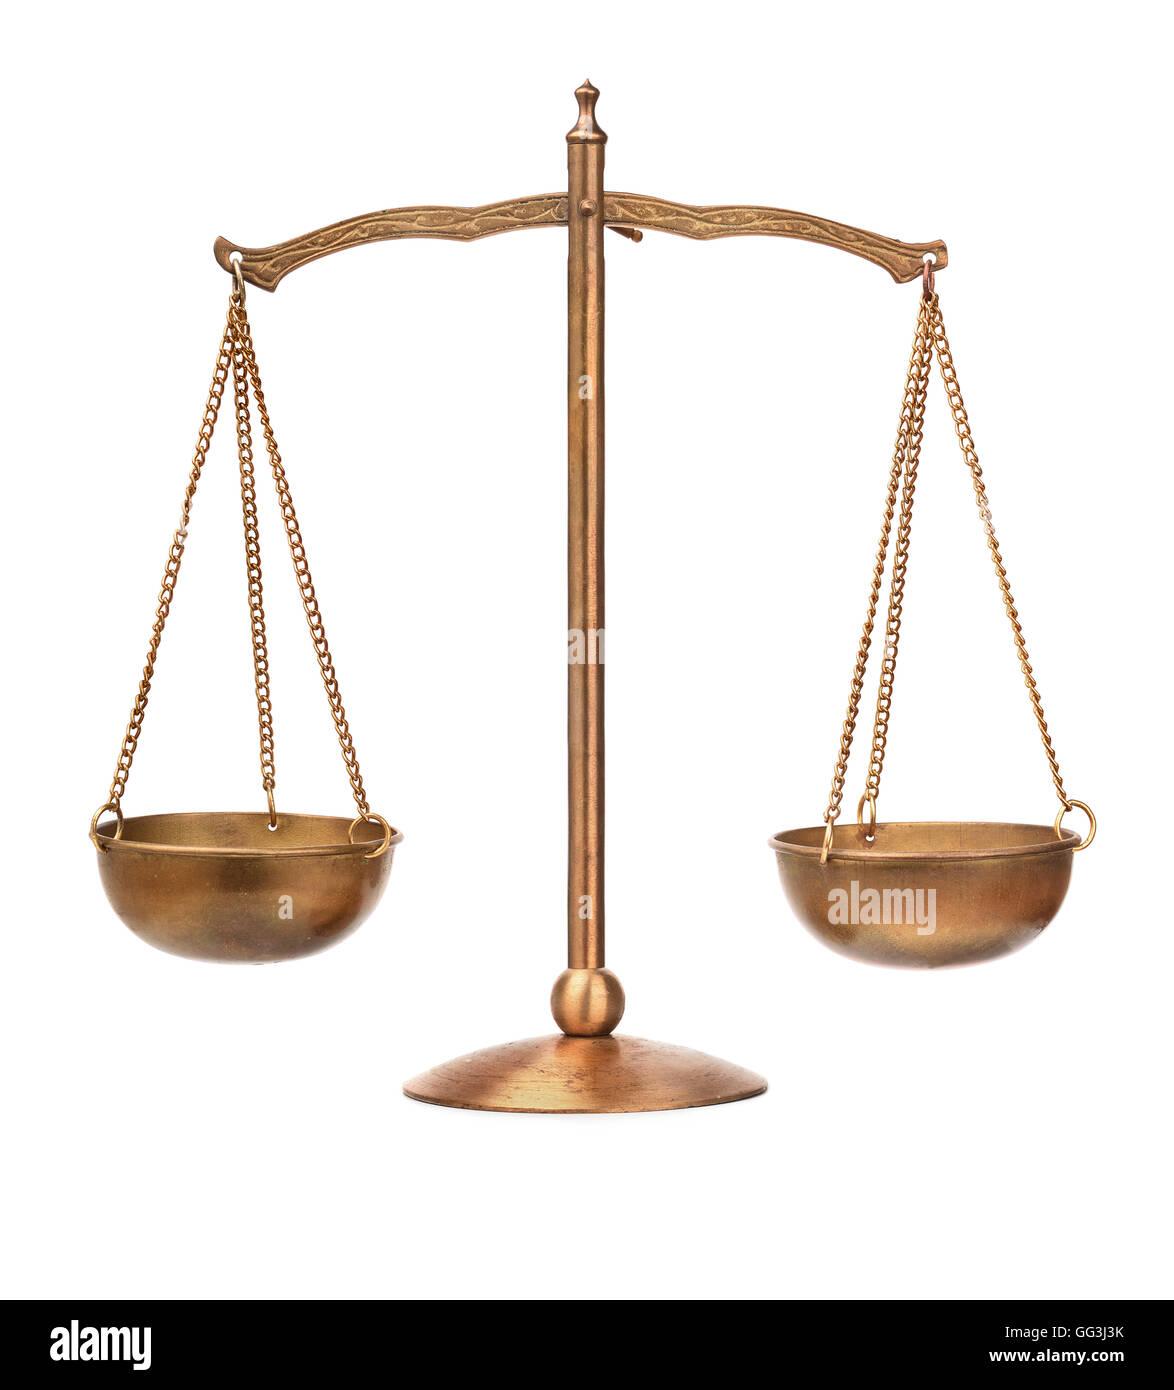 Old bronze balance scale isolated on white - Stock Image